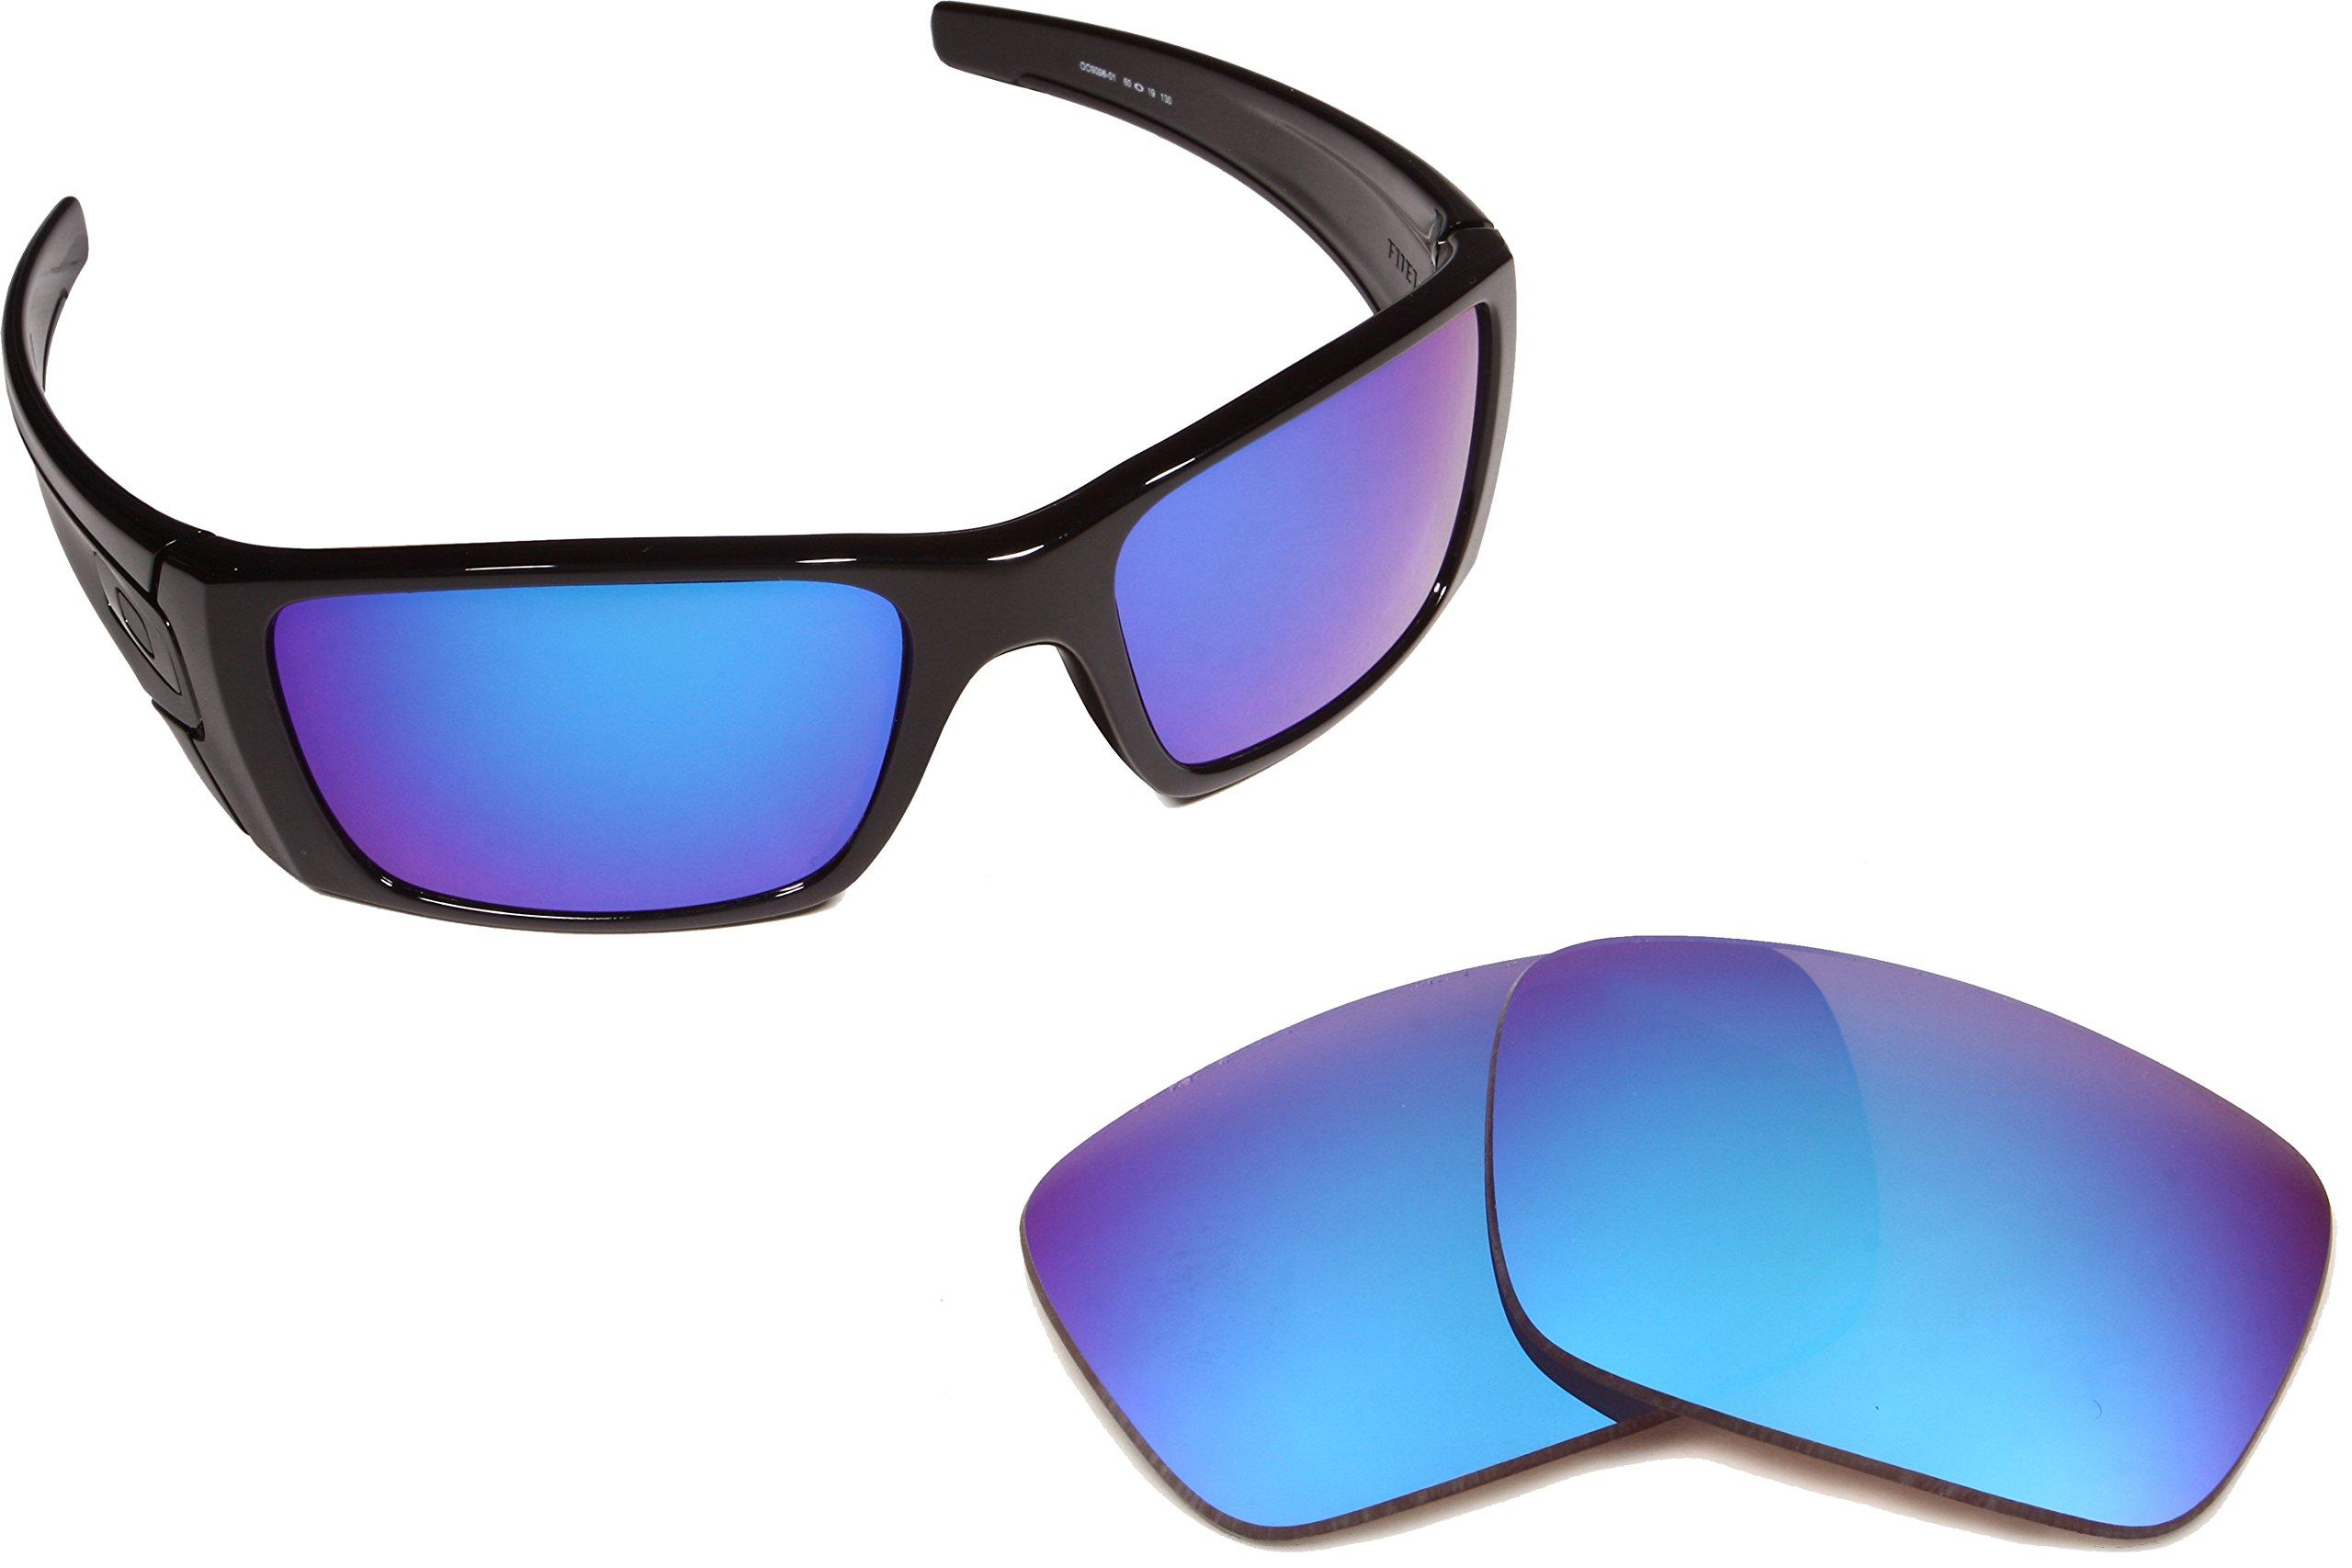 Best SEEK OPTICS Replacement Lenses Oakley FUEL CELL - Blue by Seek Optics